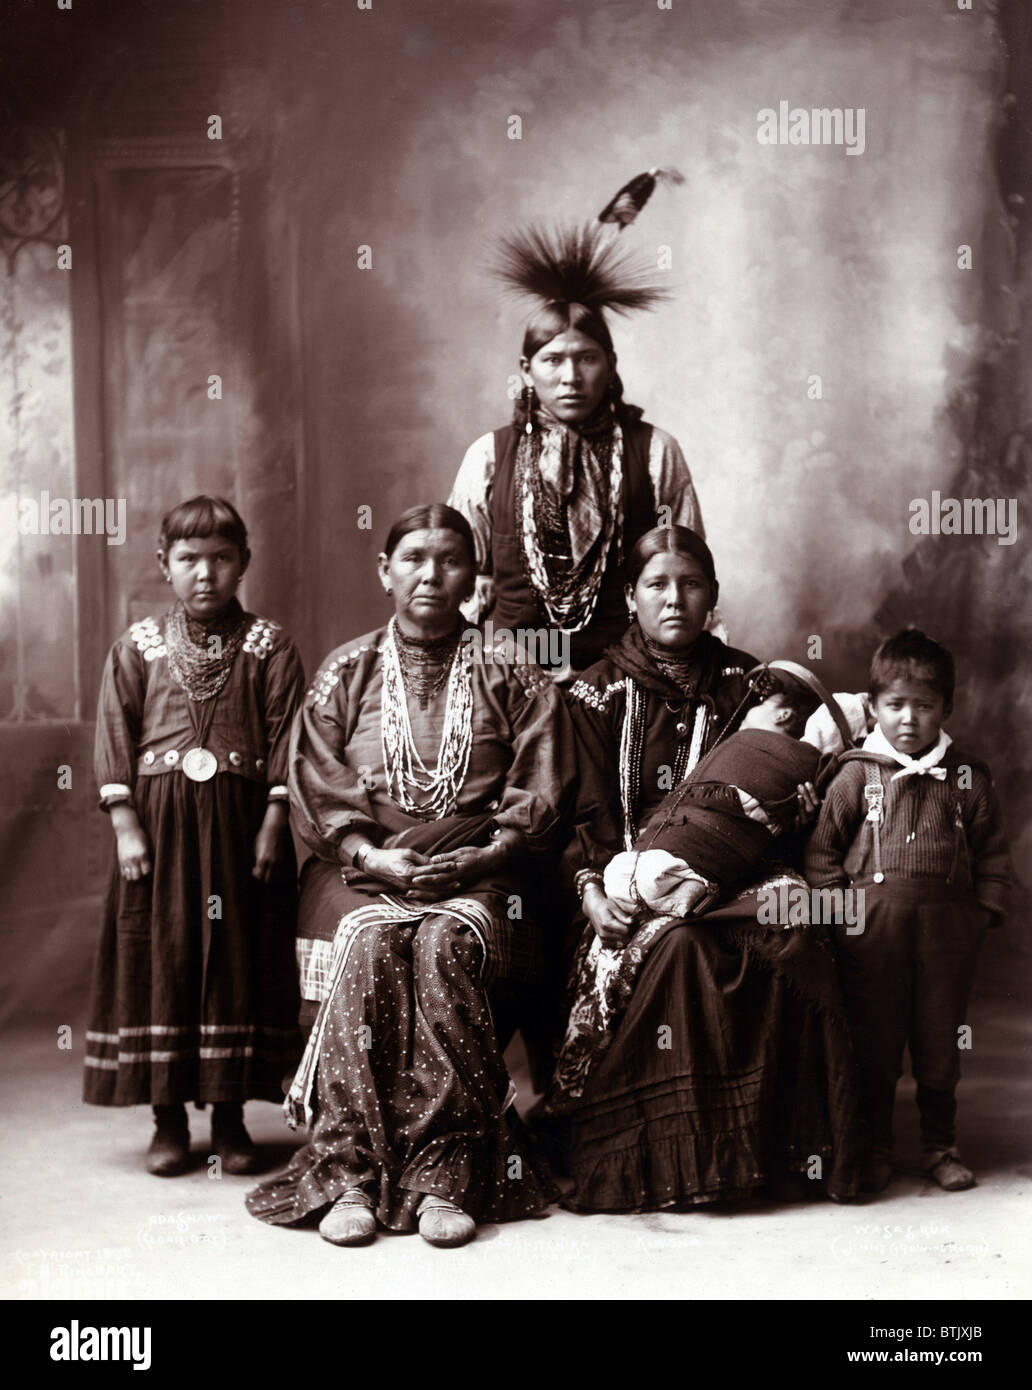 Native American family, original title: 'Sauk Indian family', photograph by Frank A. Rinehart, 1899. - Stock Image